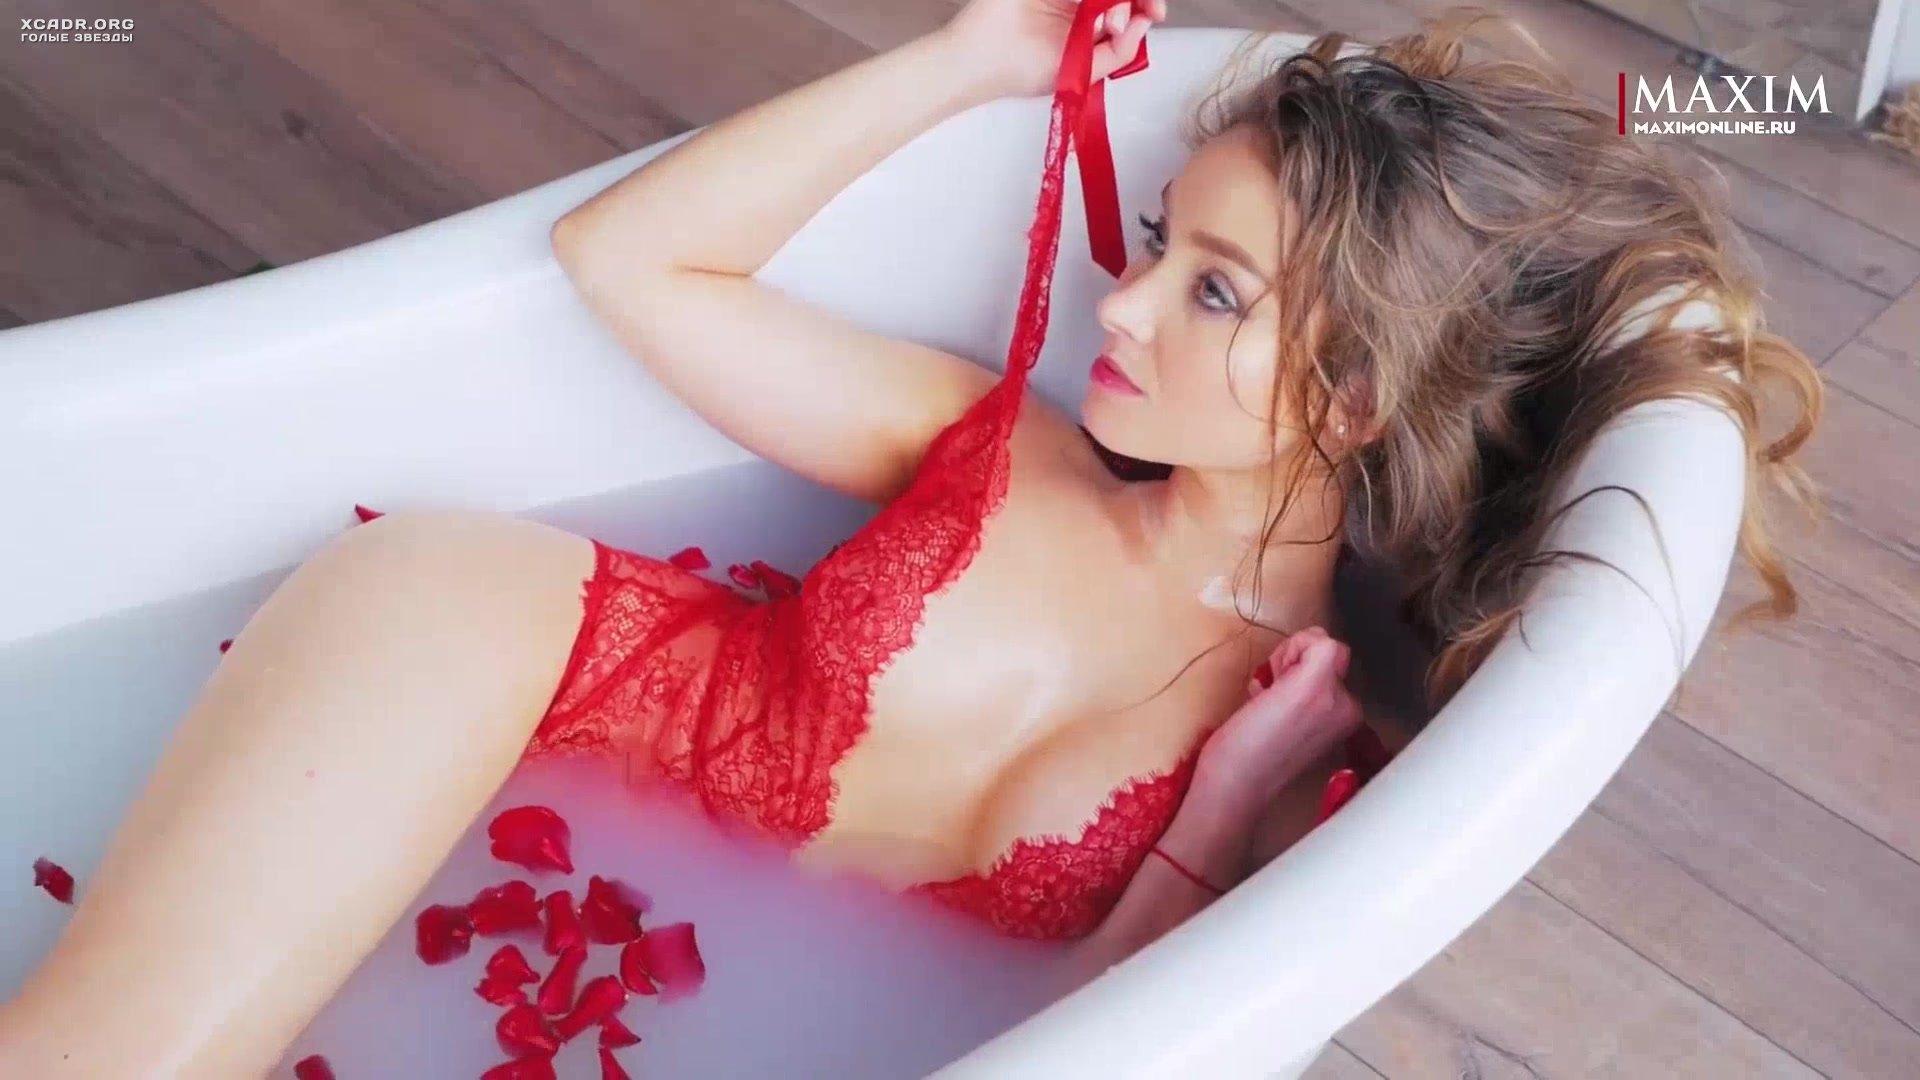 yana-iz-molodezhki-foto-seks-alira-dzheymson-porno